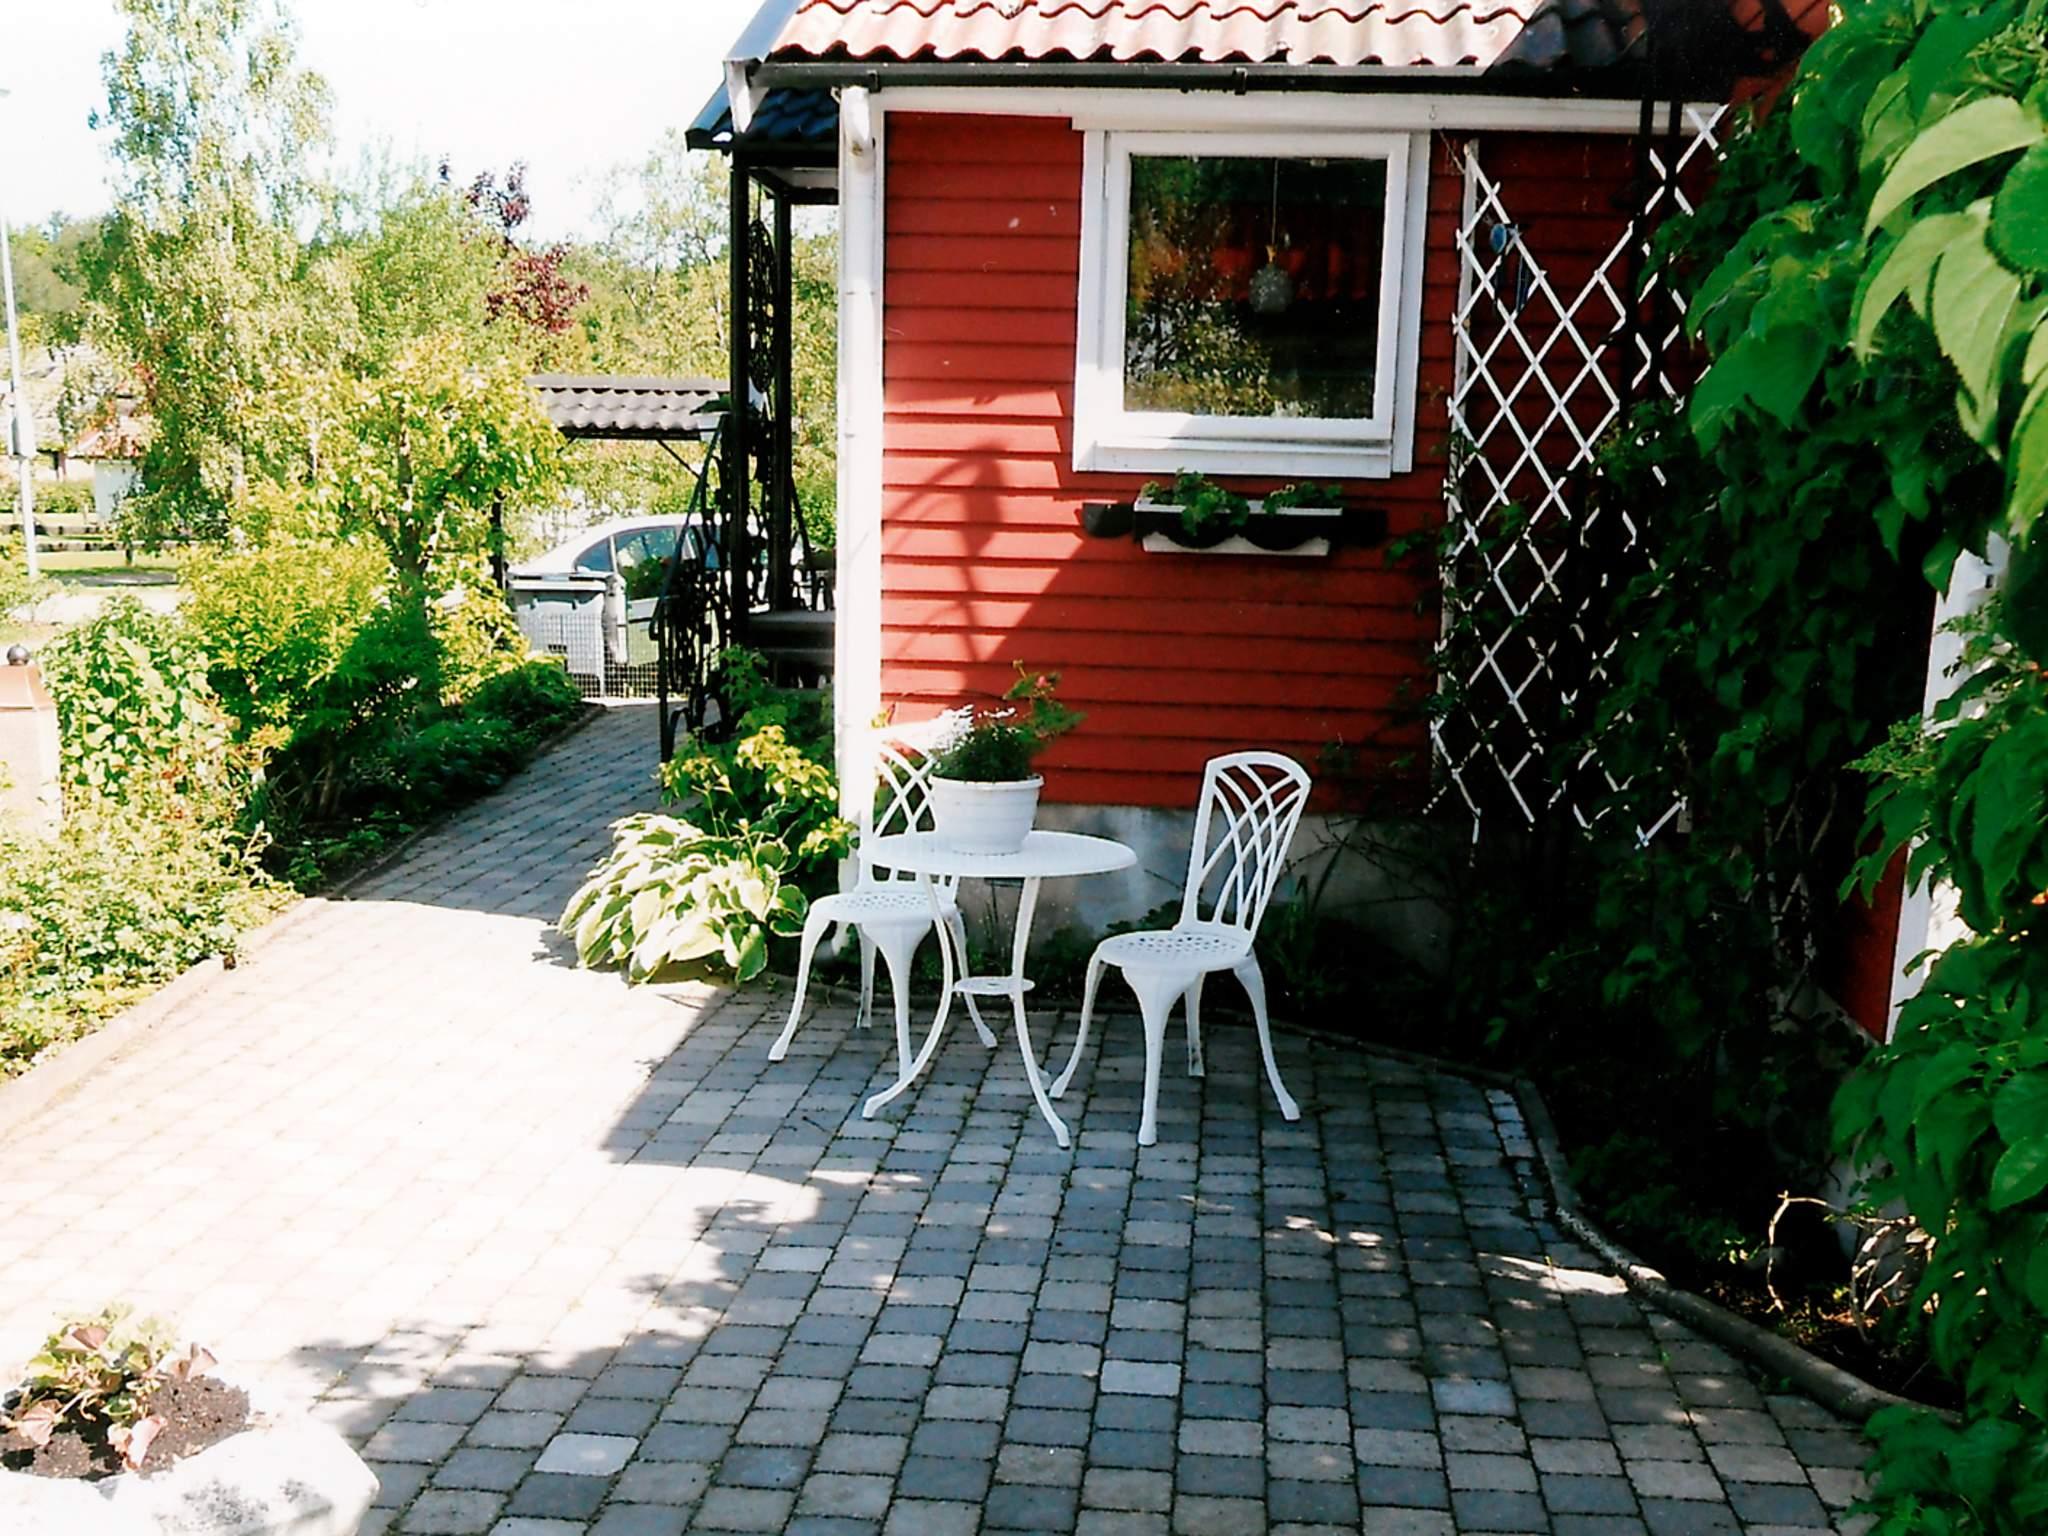 Ferienhaus Finjasjön (86936), Hässleholm, Skane län, Südschweden, Schweden, Bild 11